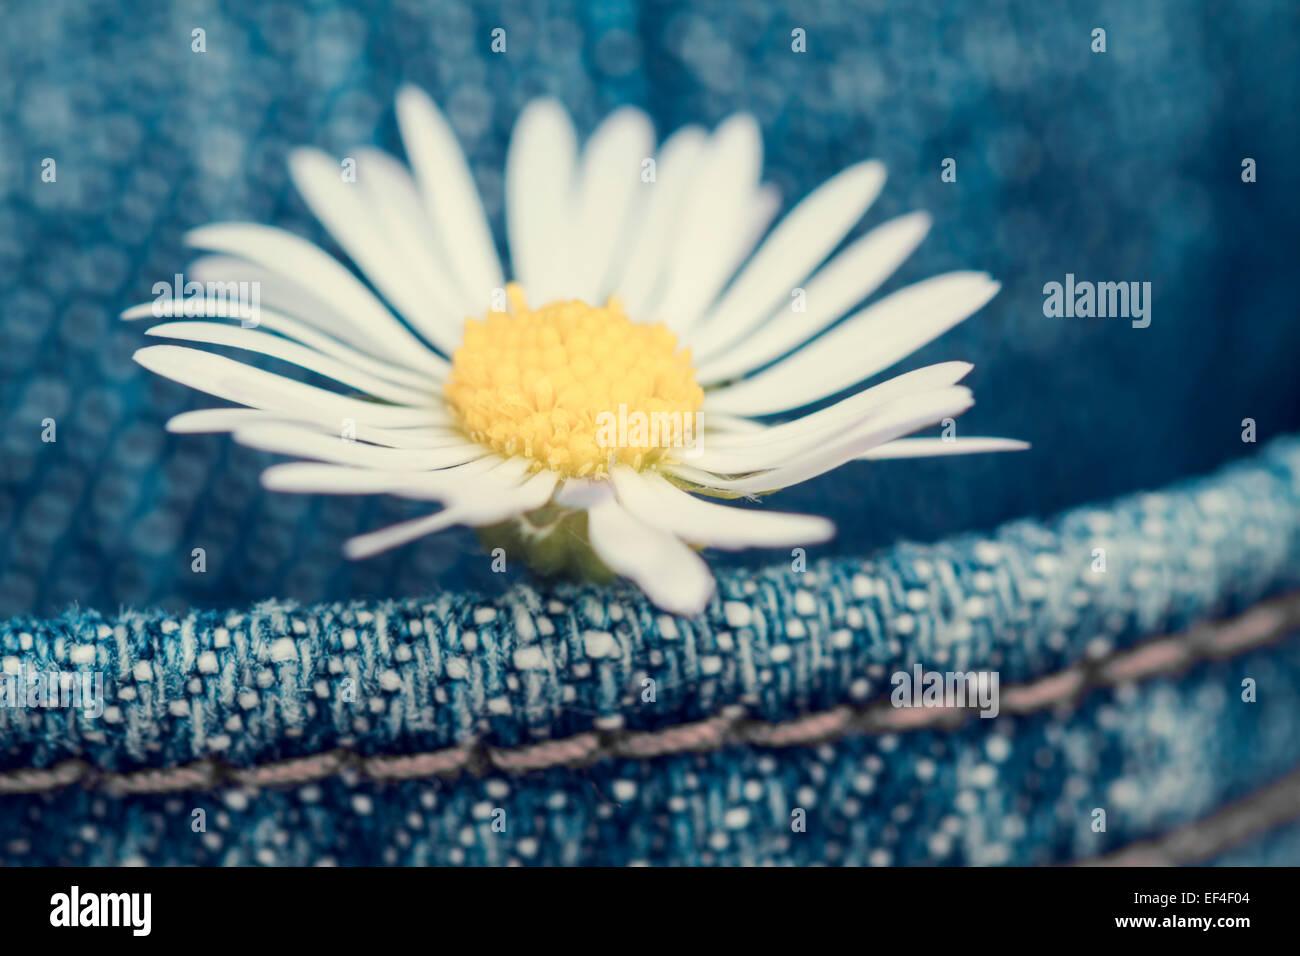 Concepto, flor de margarita en un bolsillo de Jean pantalones Imagen De Stock